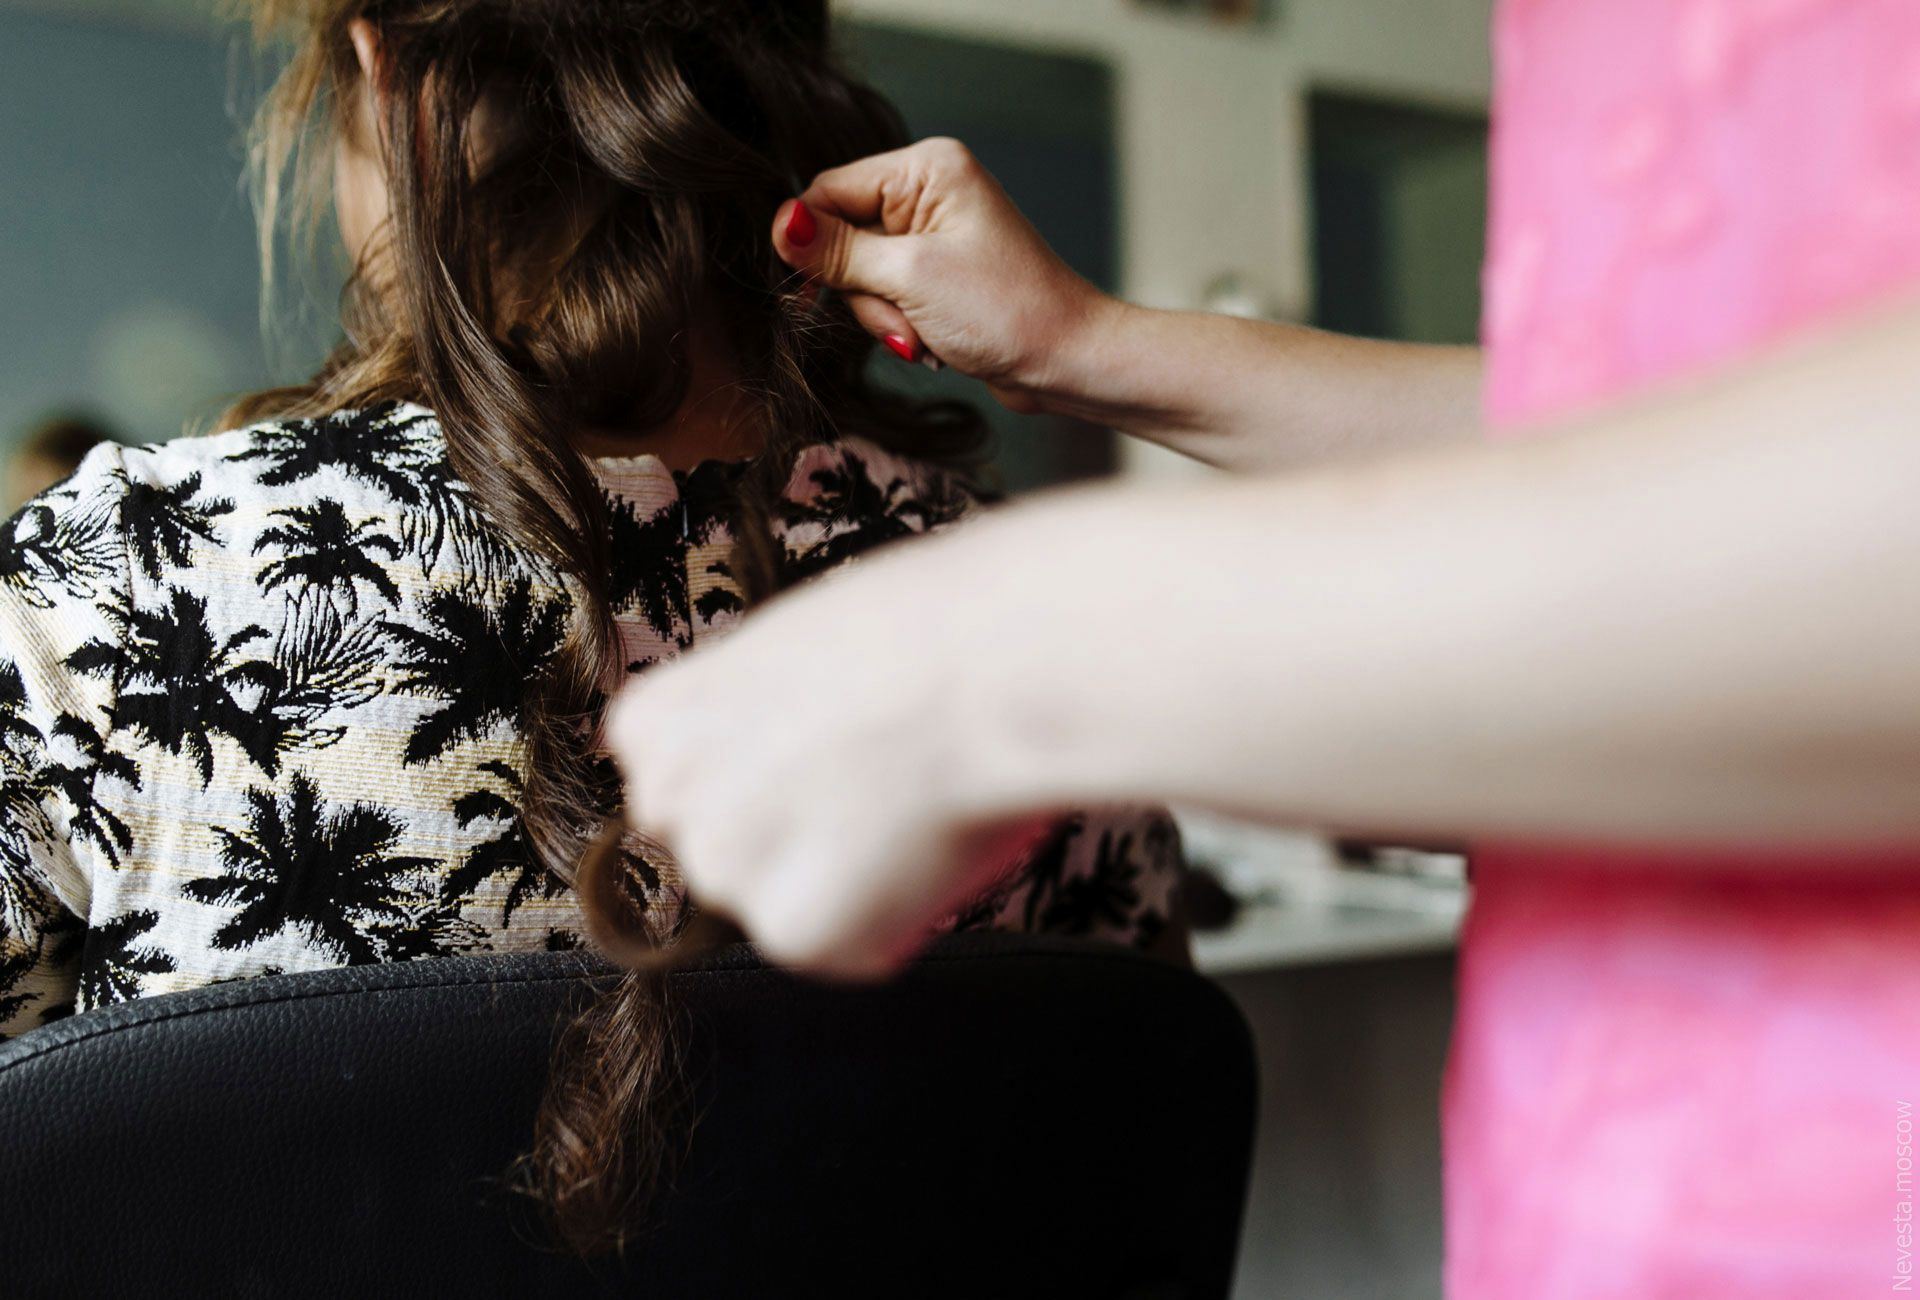 Сиренево-фиолетовая гамма, стрелки, макияж стилист, фото 5